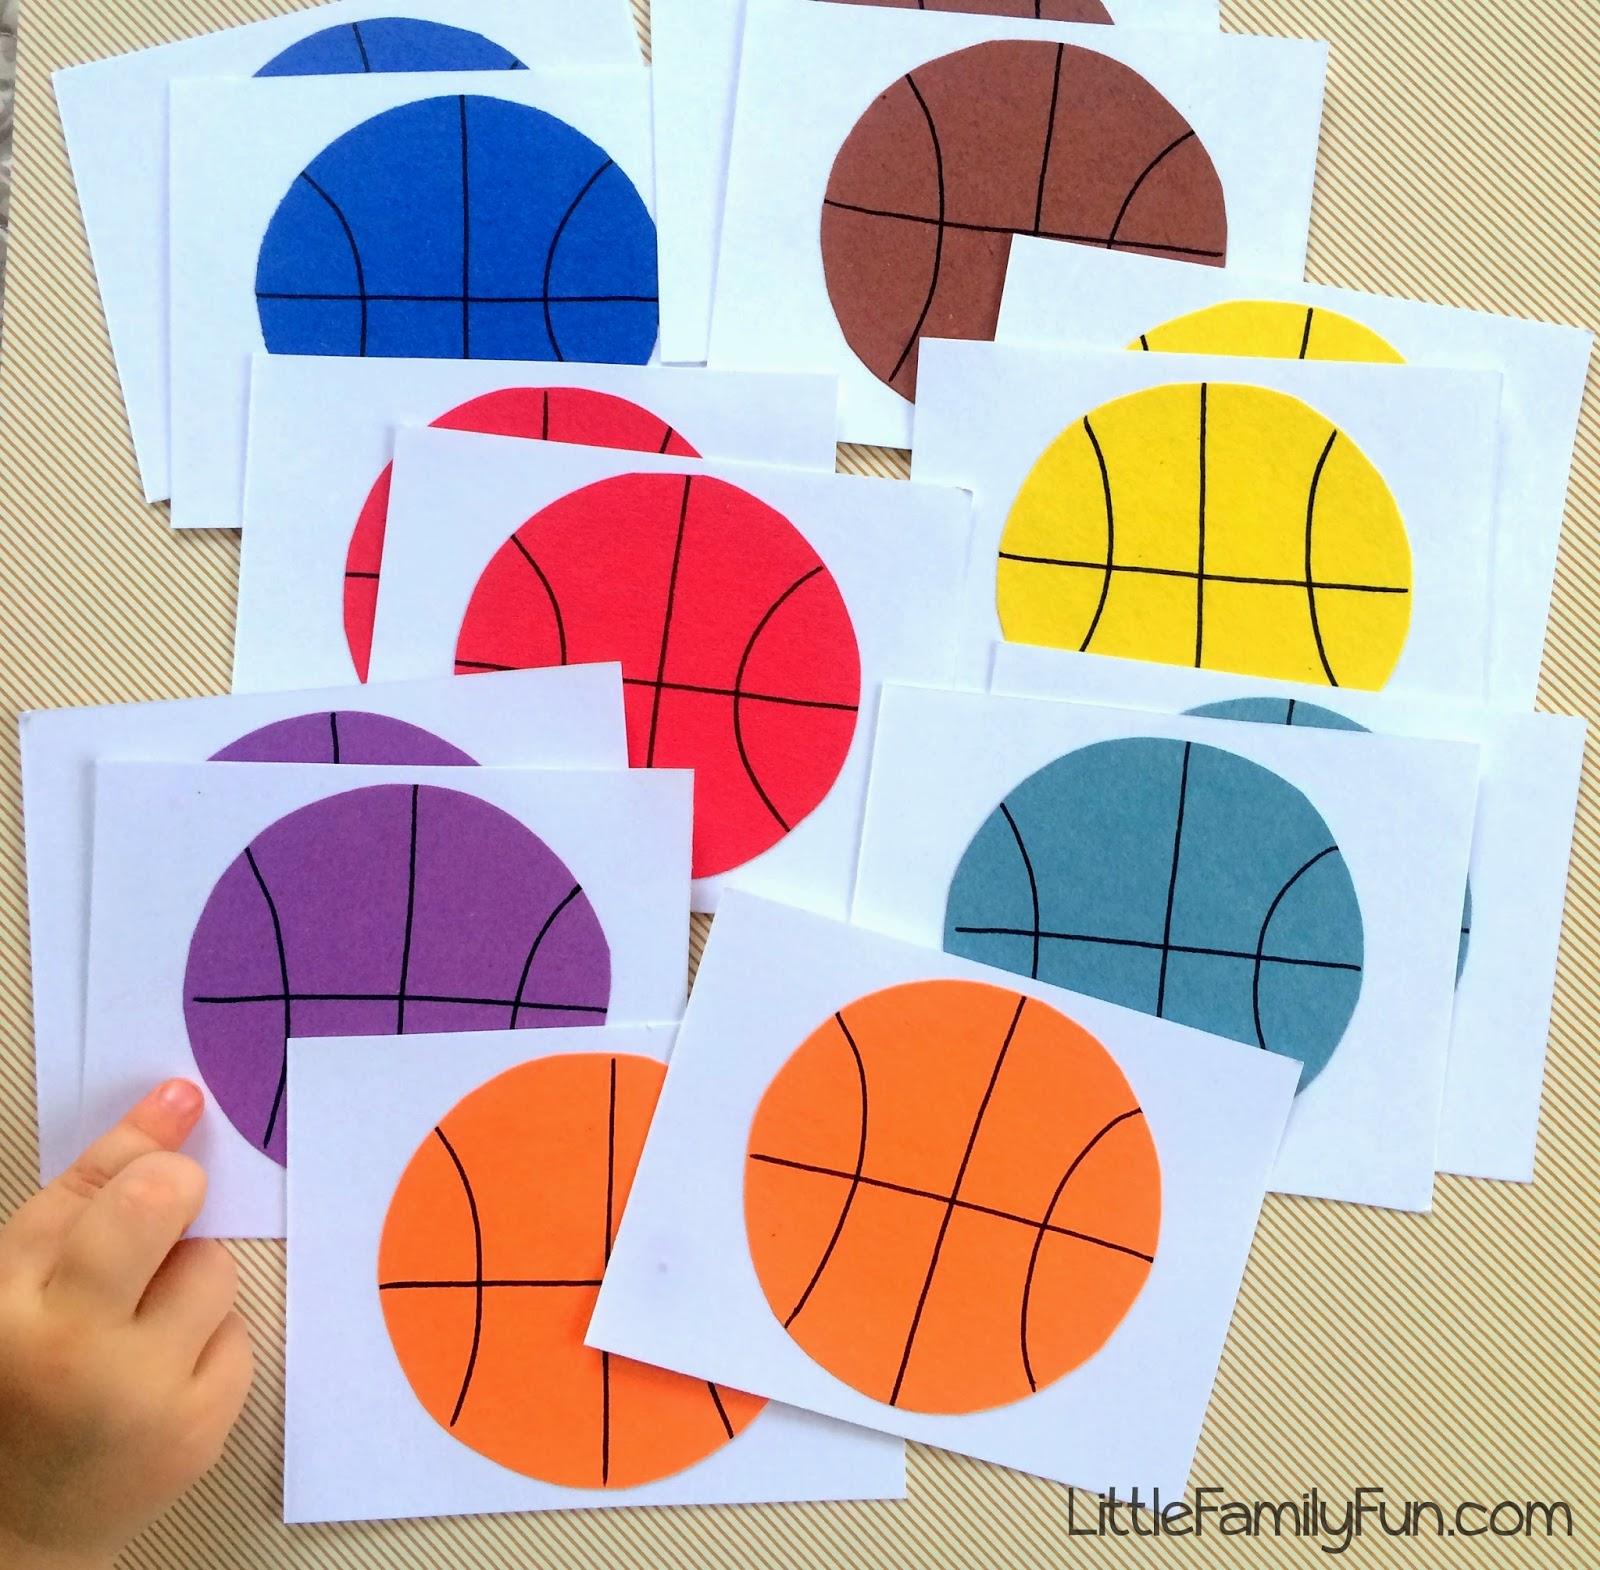 Little Family Fun Basketball Memory